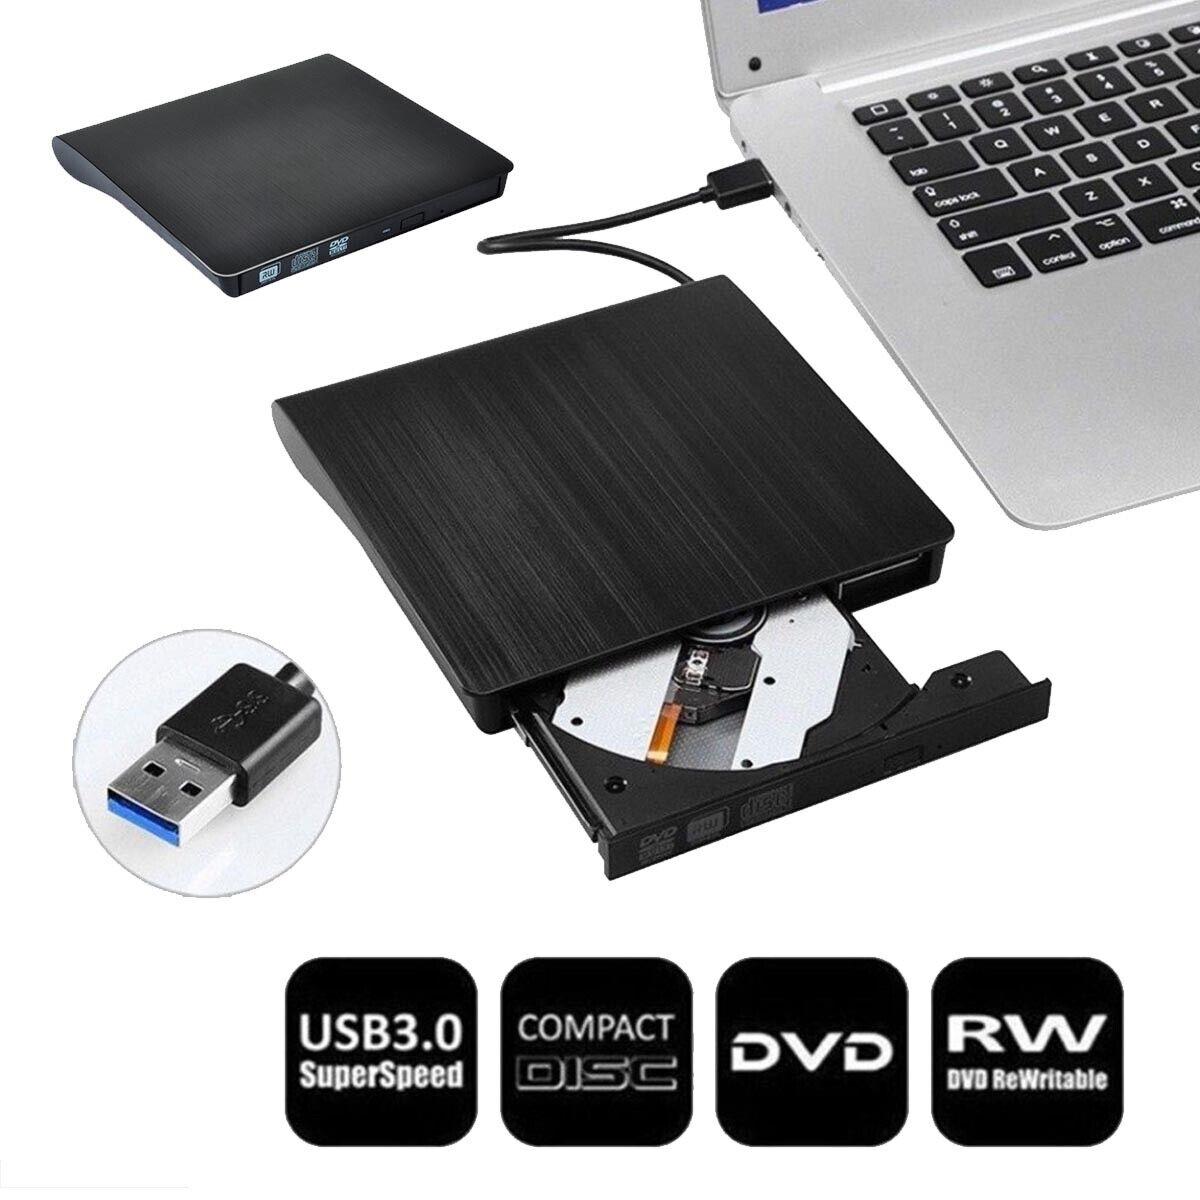 USB 3.0 Extern CD-RW Brenner Portable Slim Laufwerk DVD Combo Brenner Notebook